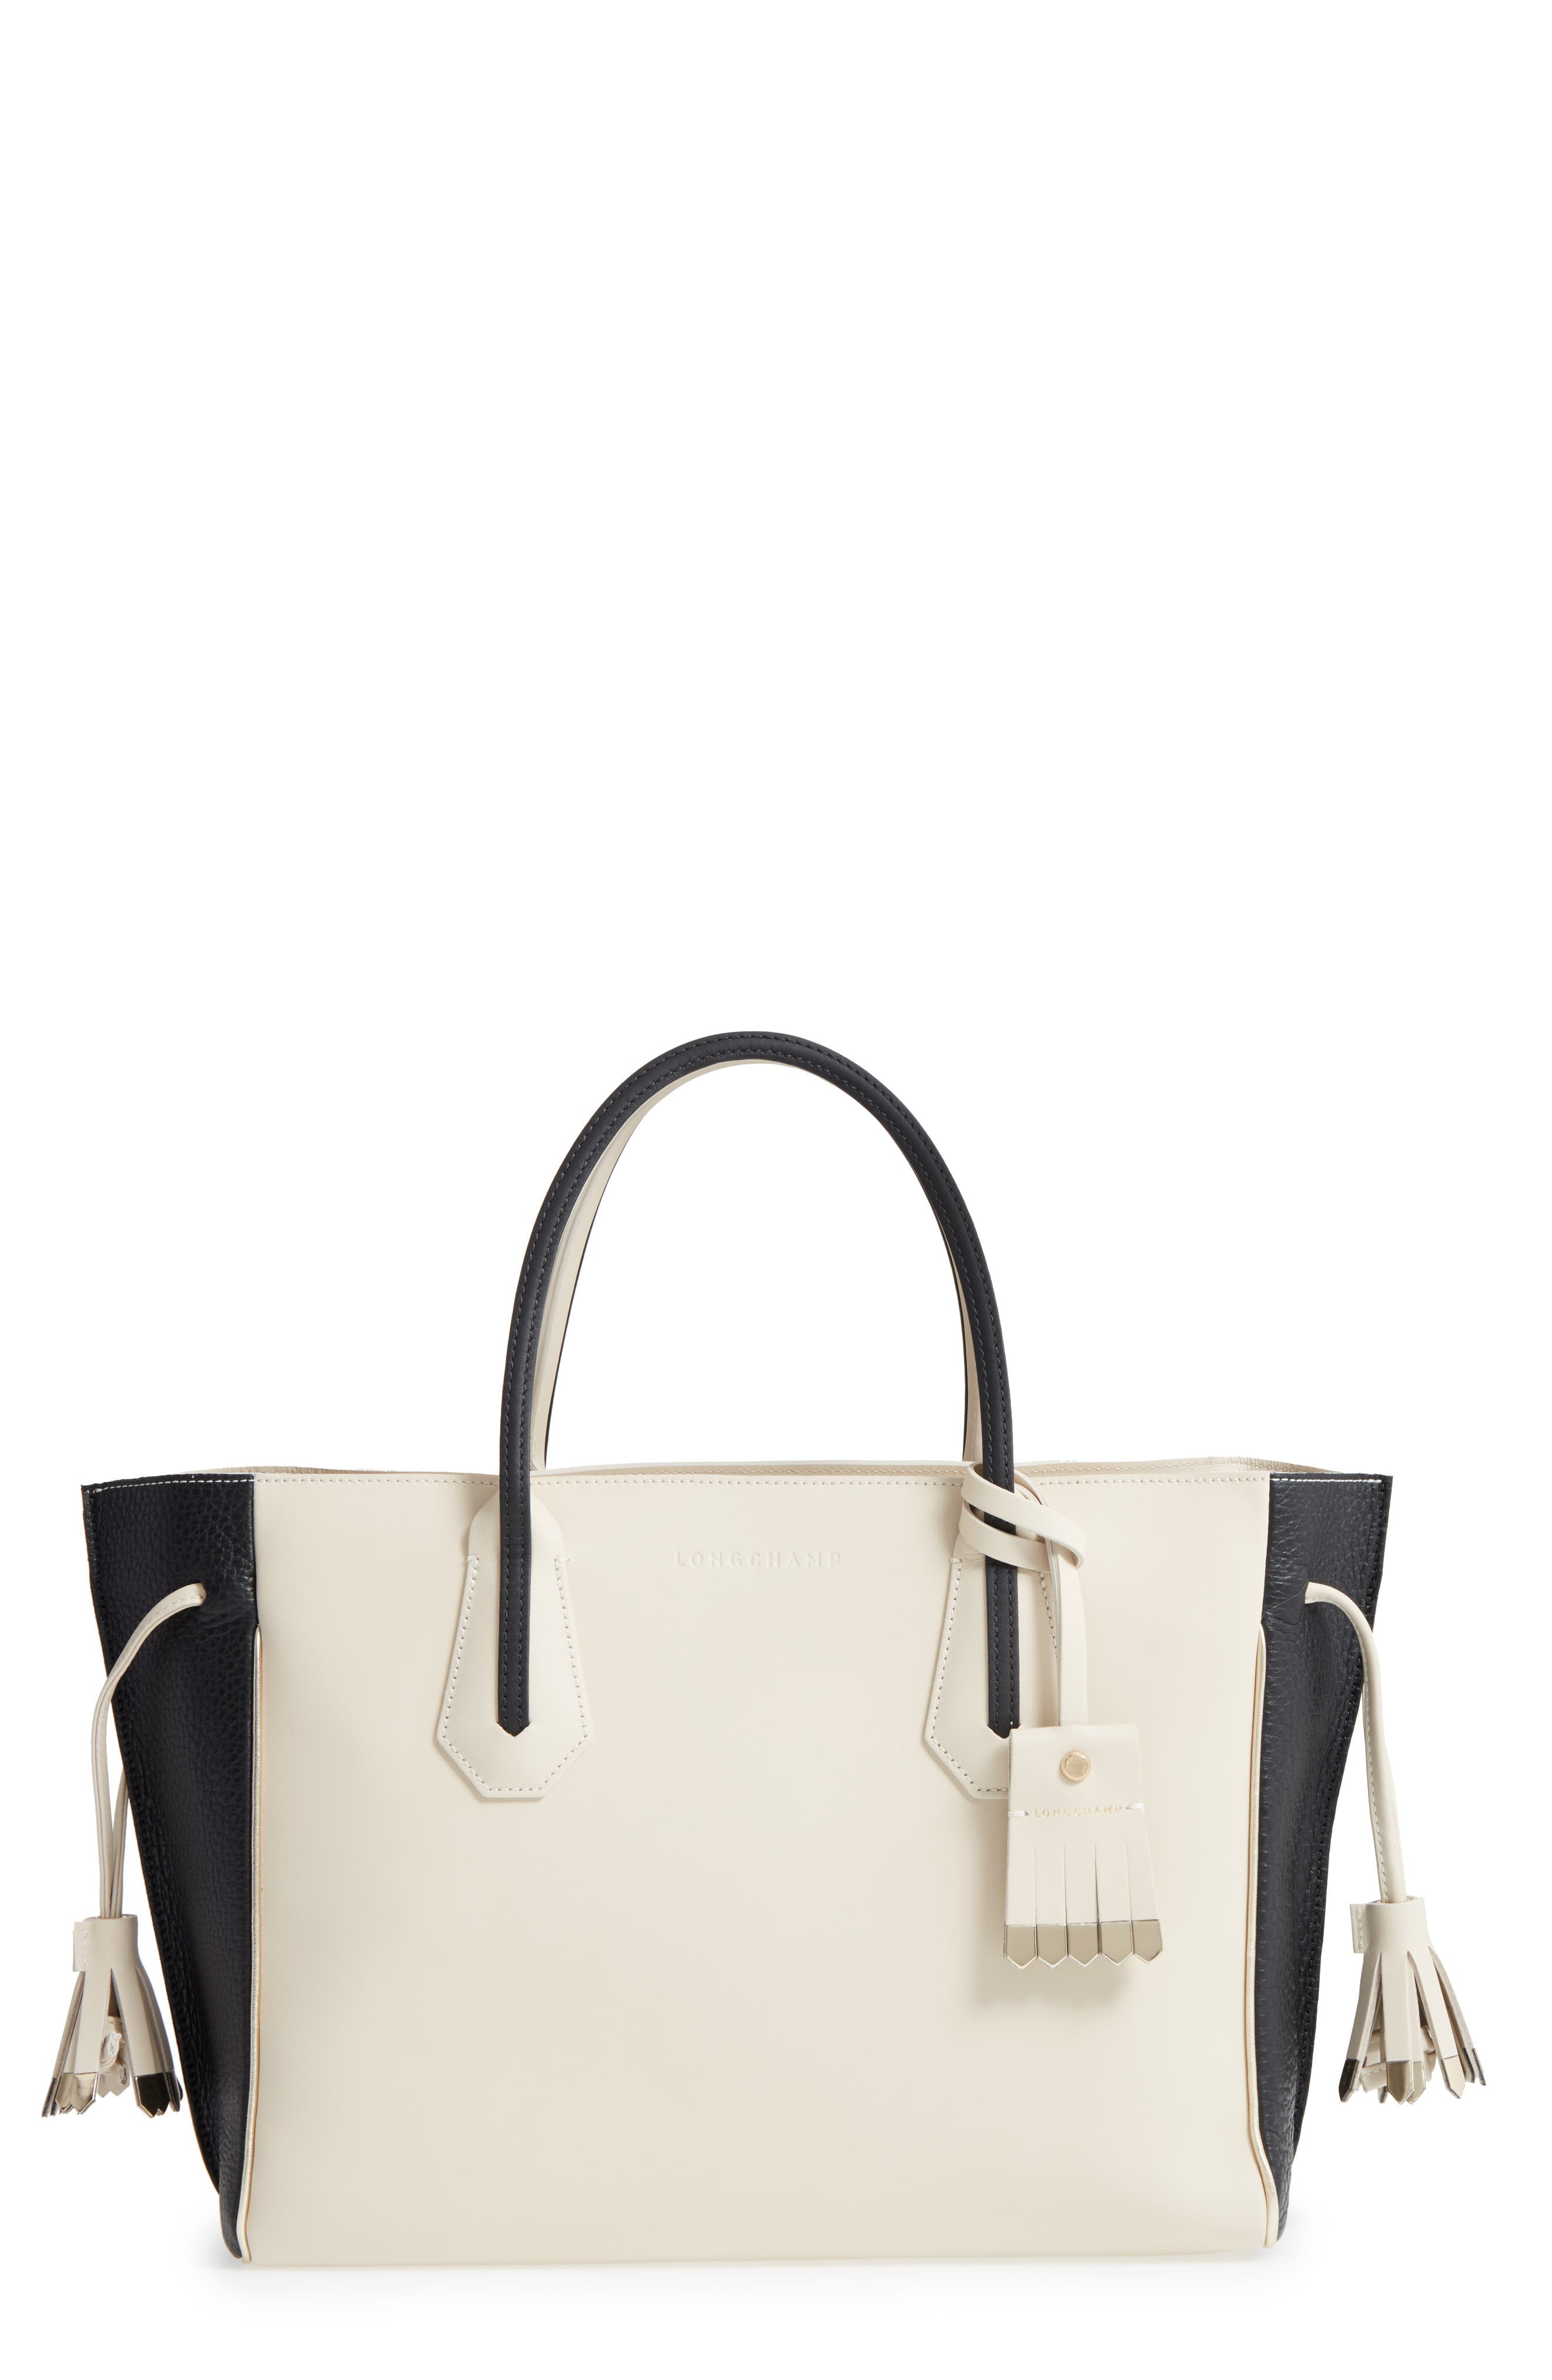 Alternate Image 1 Selected - Longchamp Medium Penelope Fantasie Luxe Leather Tote